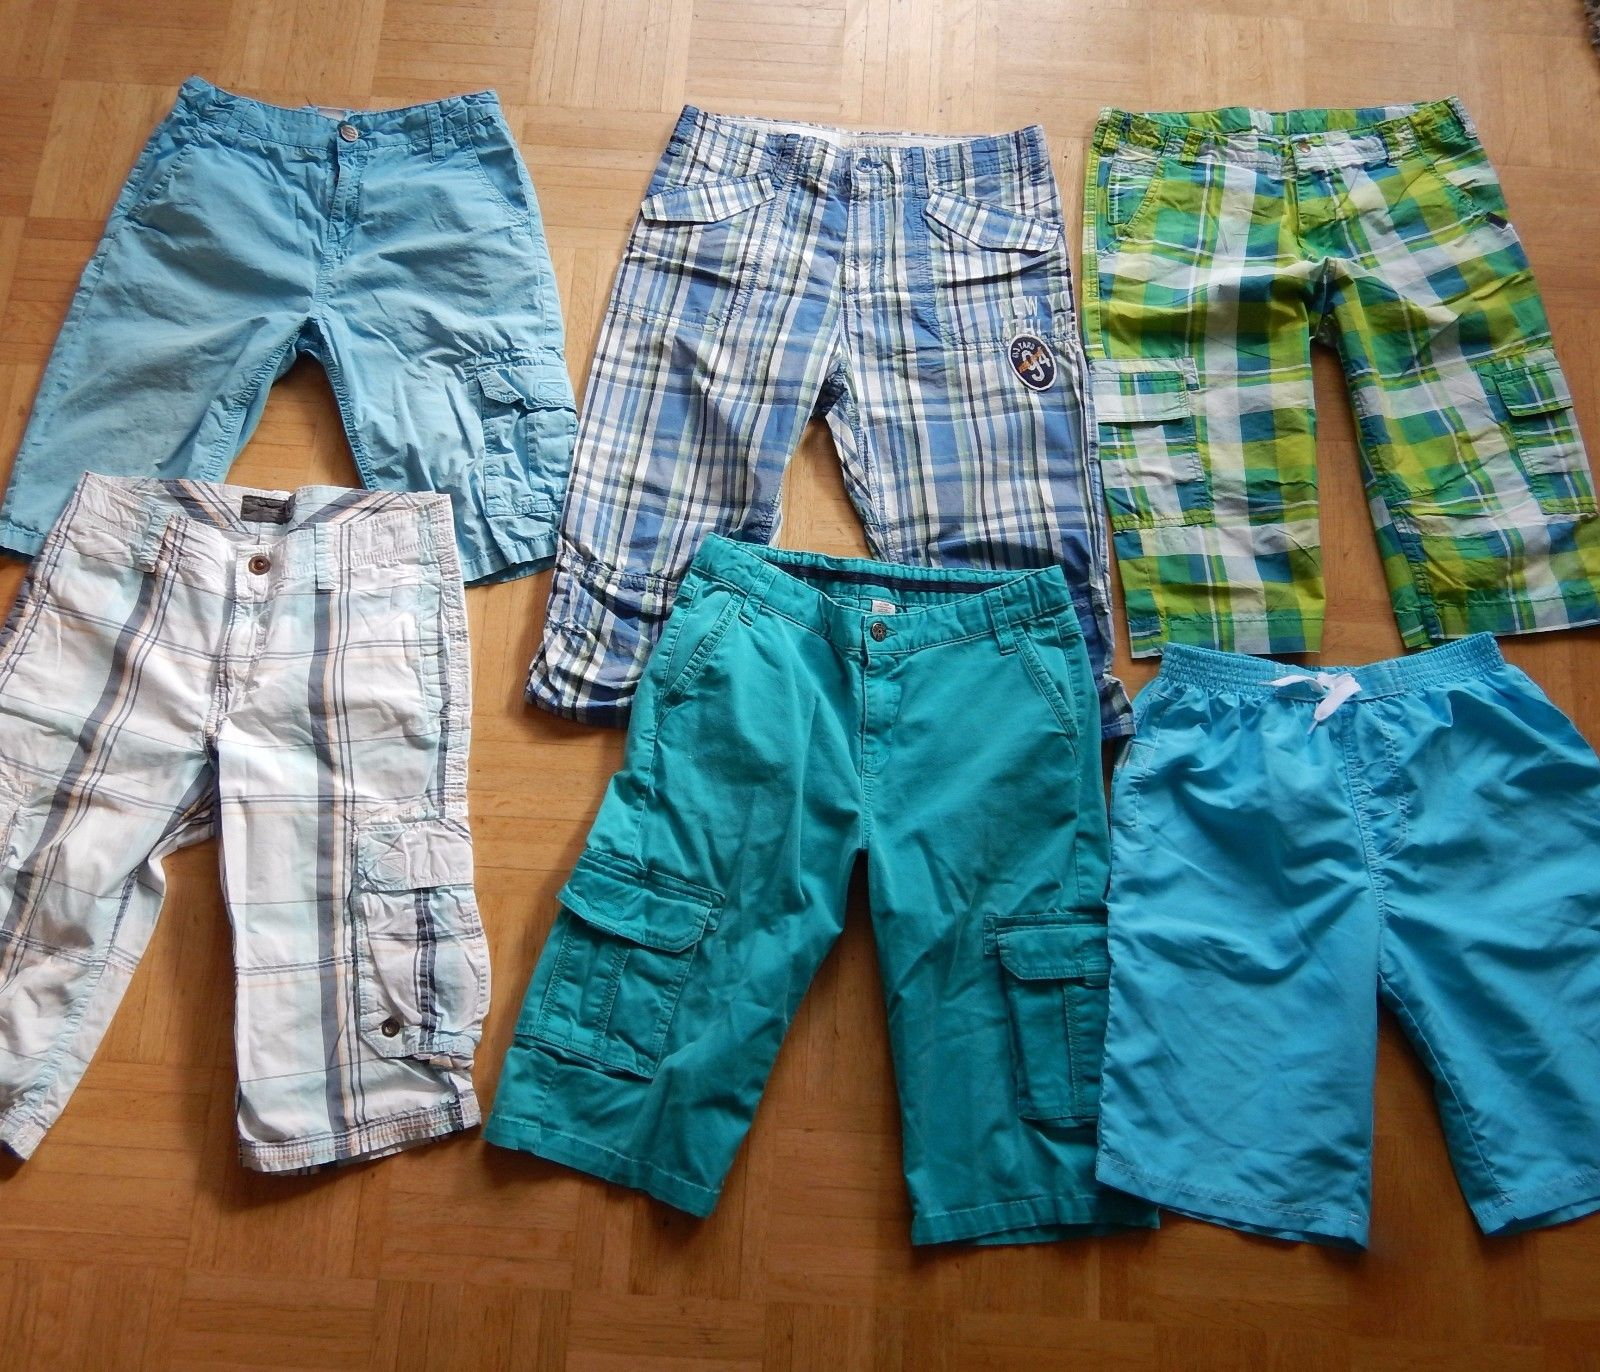 Jungen Hosenpaket Shorts kurze Hosen 6 Stck. Gr. 158 - 164: s.Oliver, H&M...